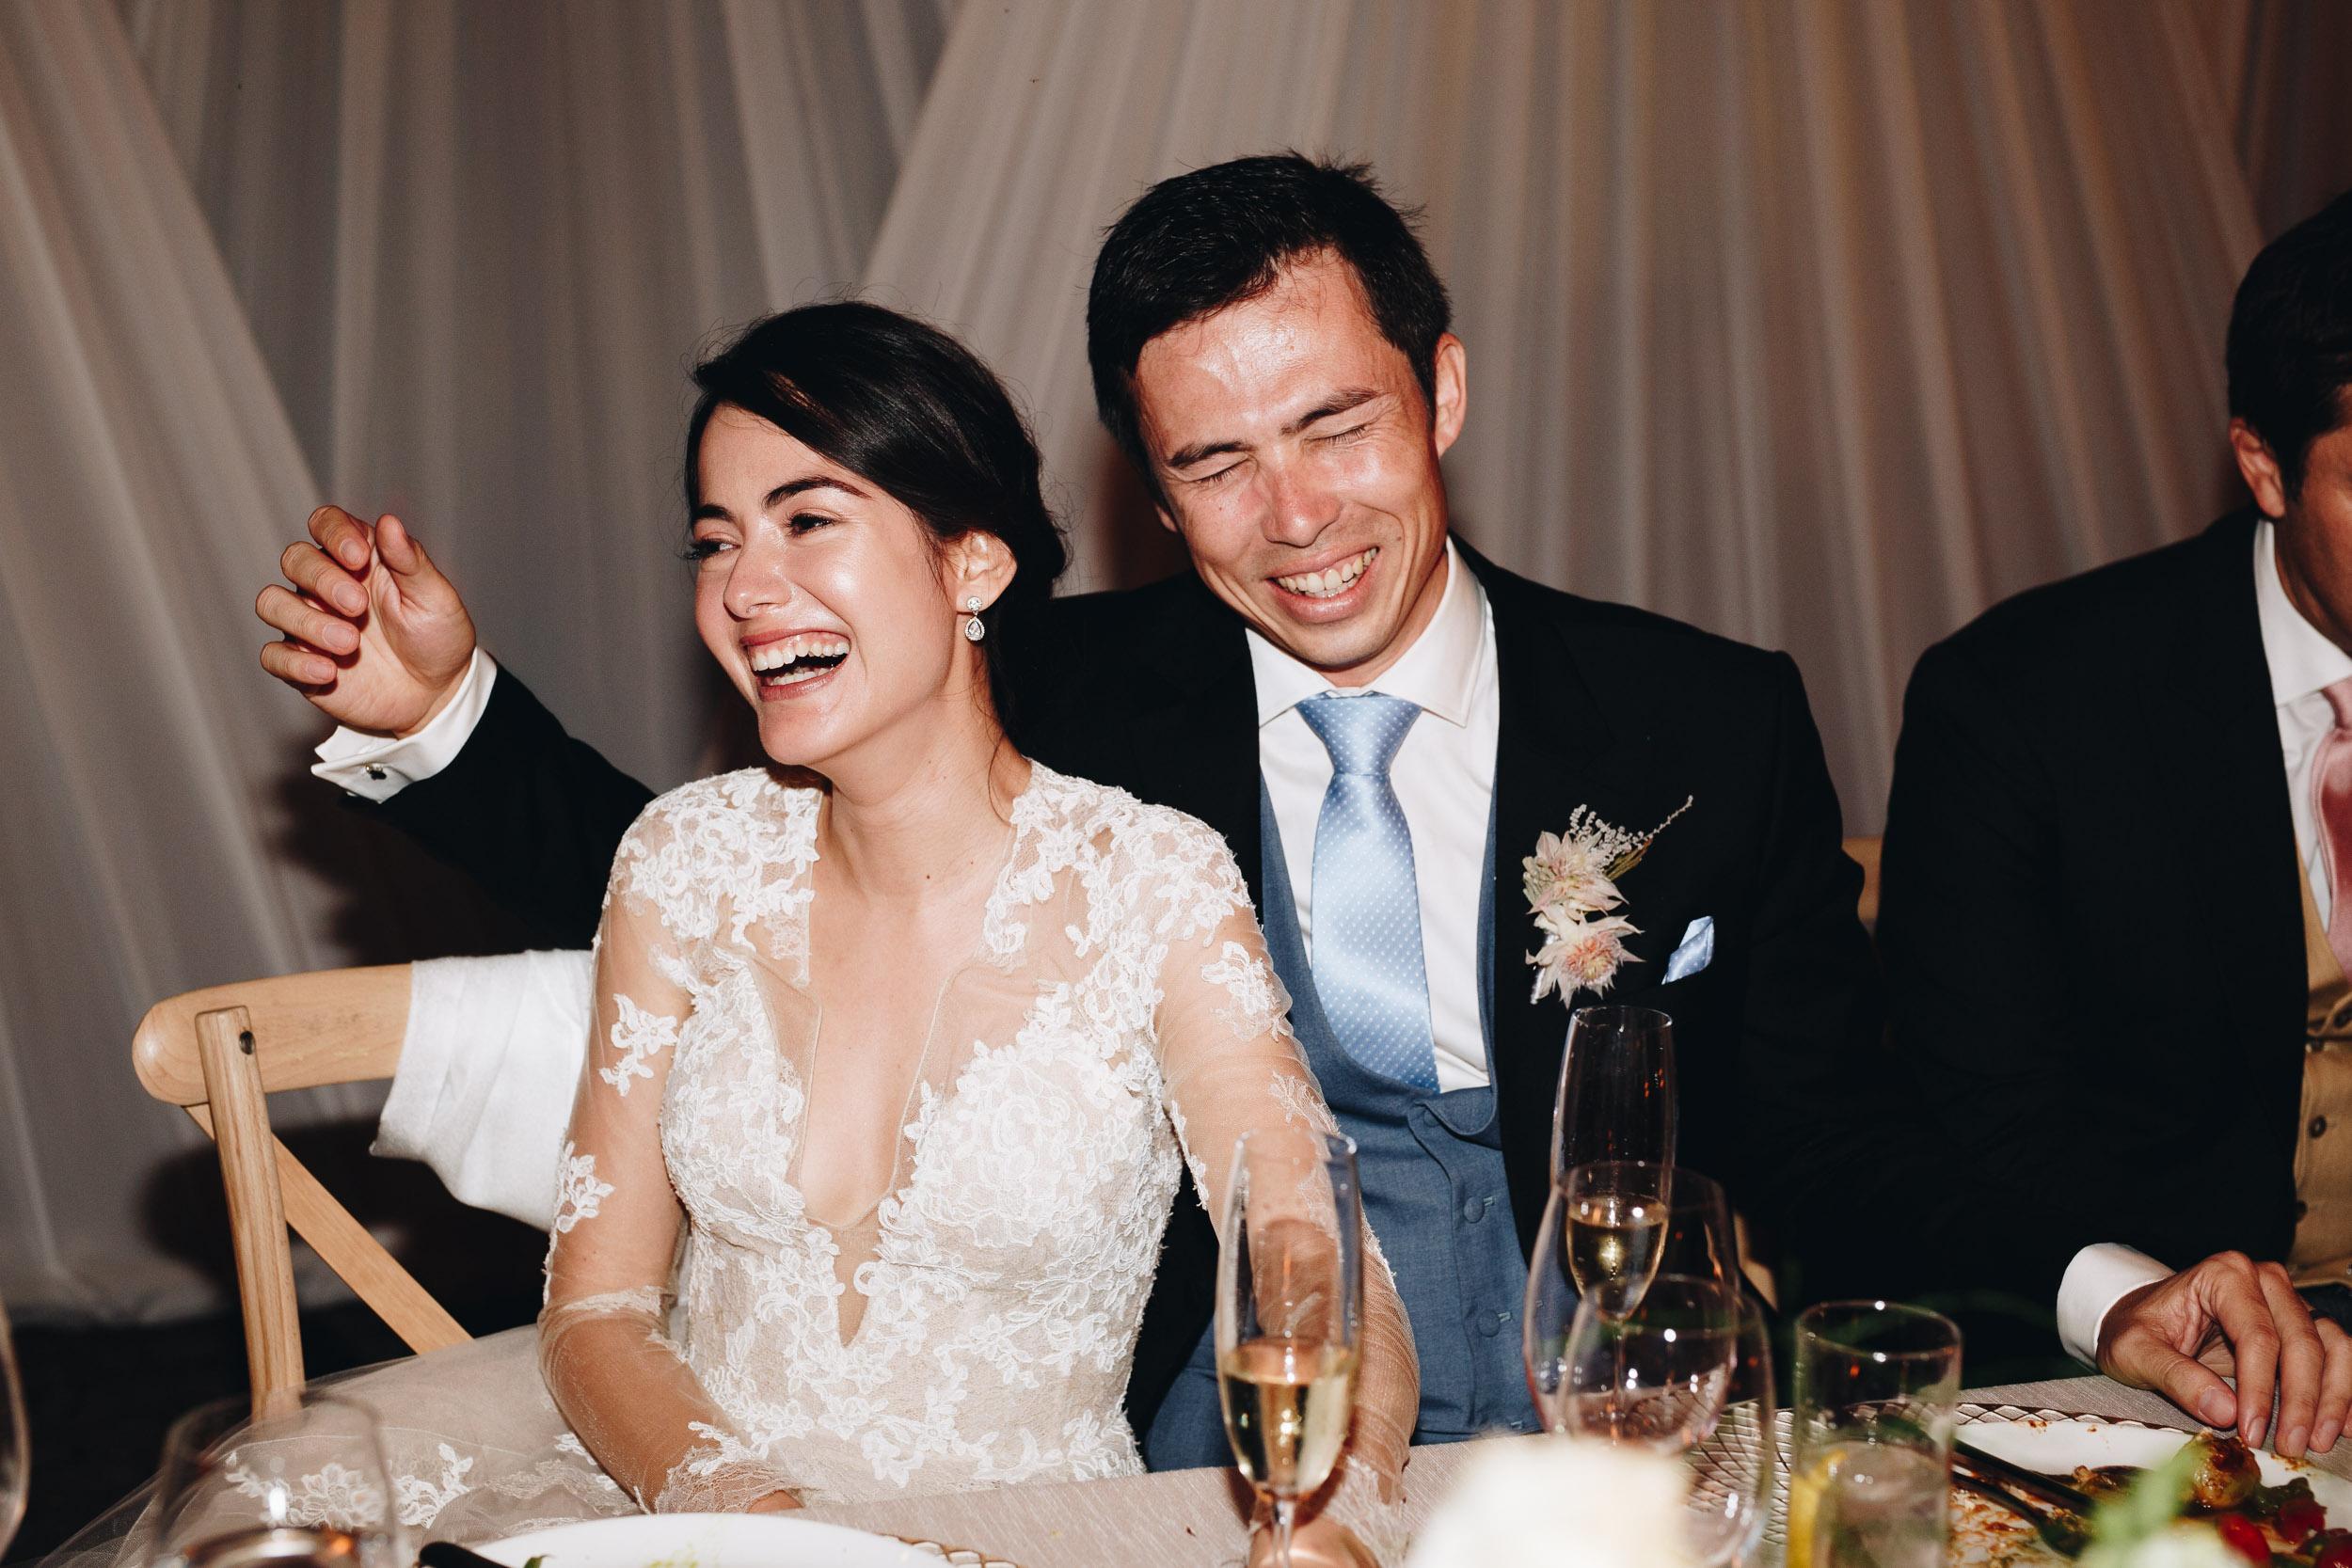 Jenny-Rockett-John-Scranton-Cape-Town-Wedding-Photographer-Andrea-Kellan-217.jpg